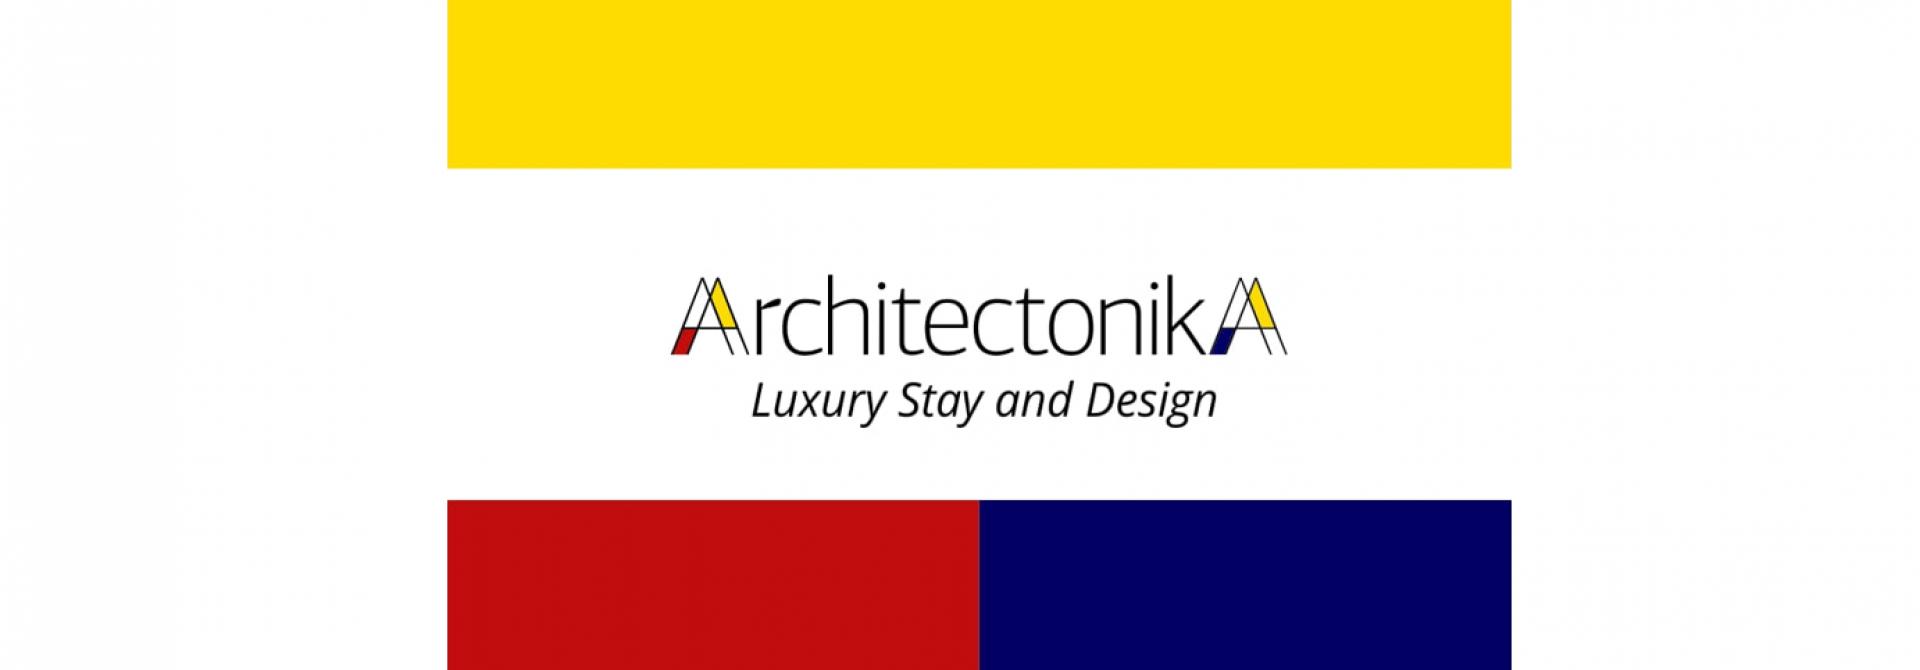 Architectonika